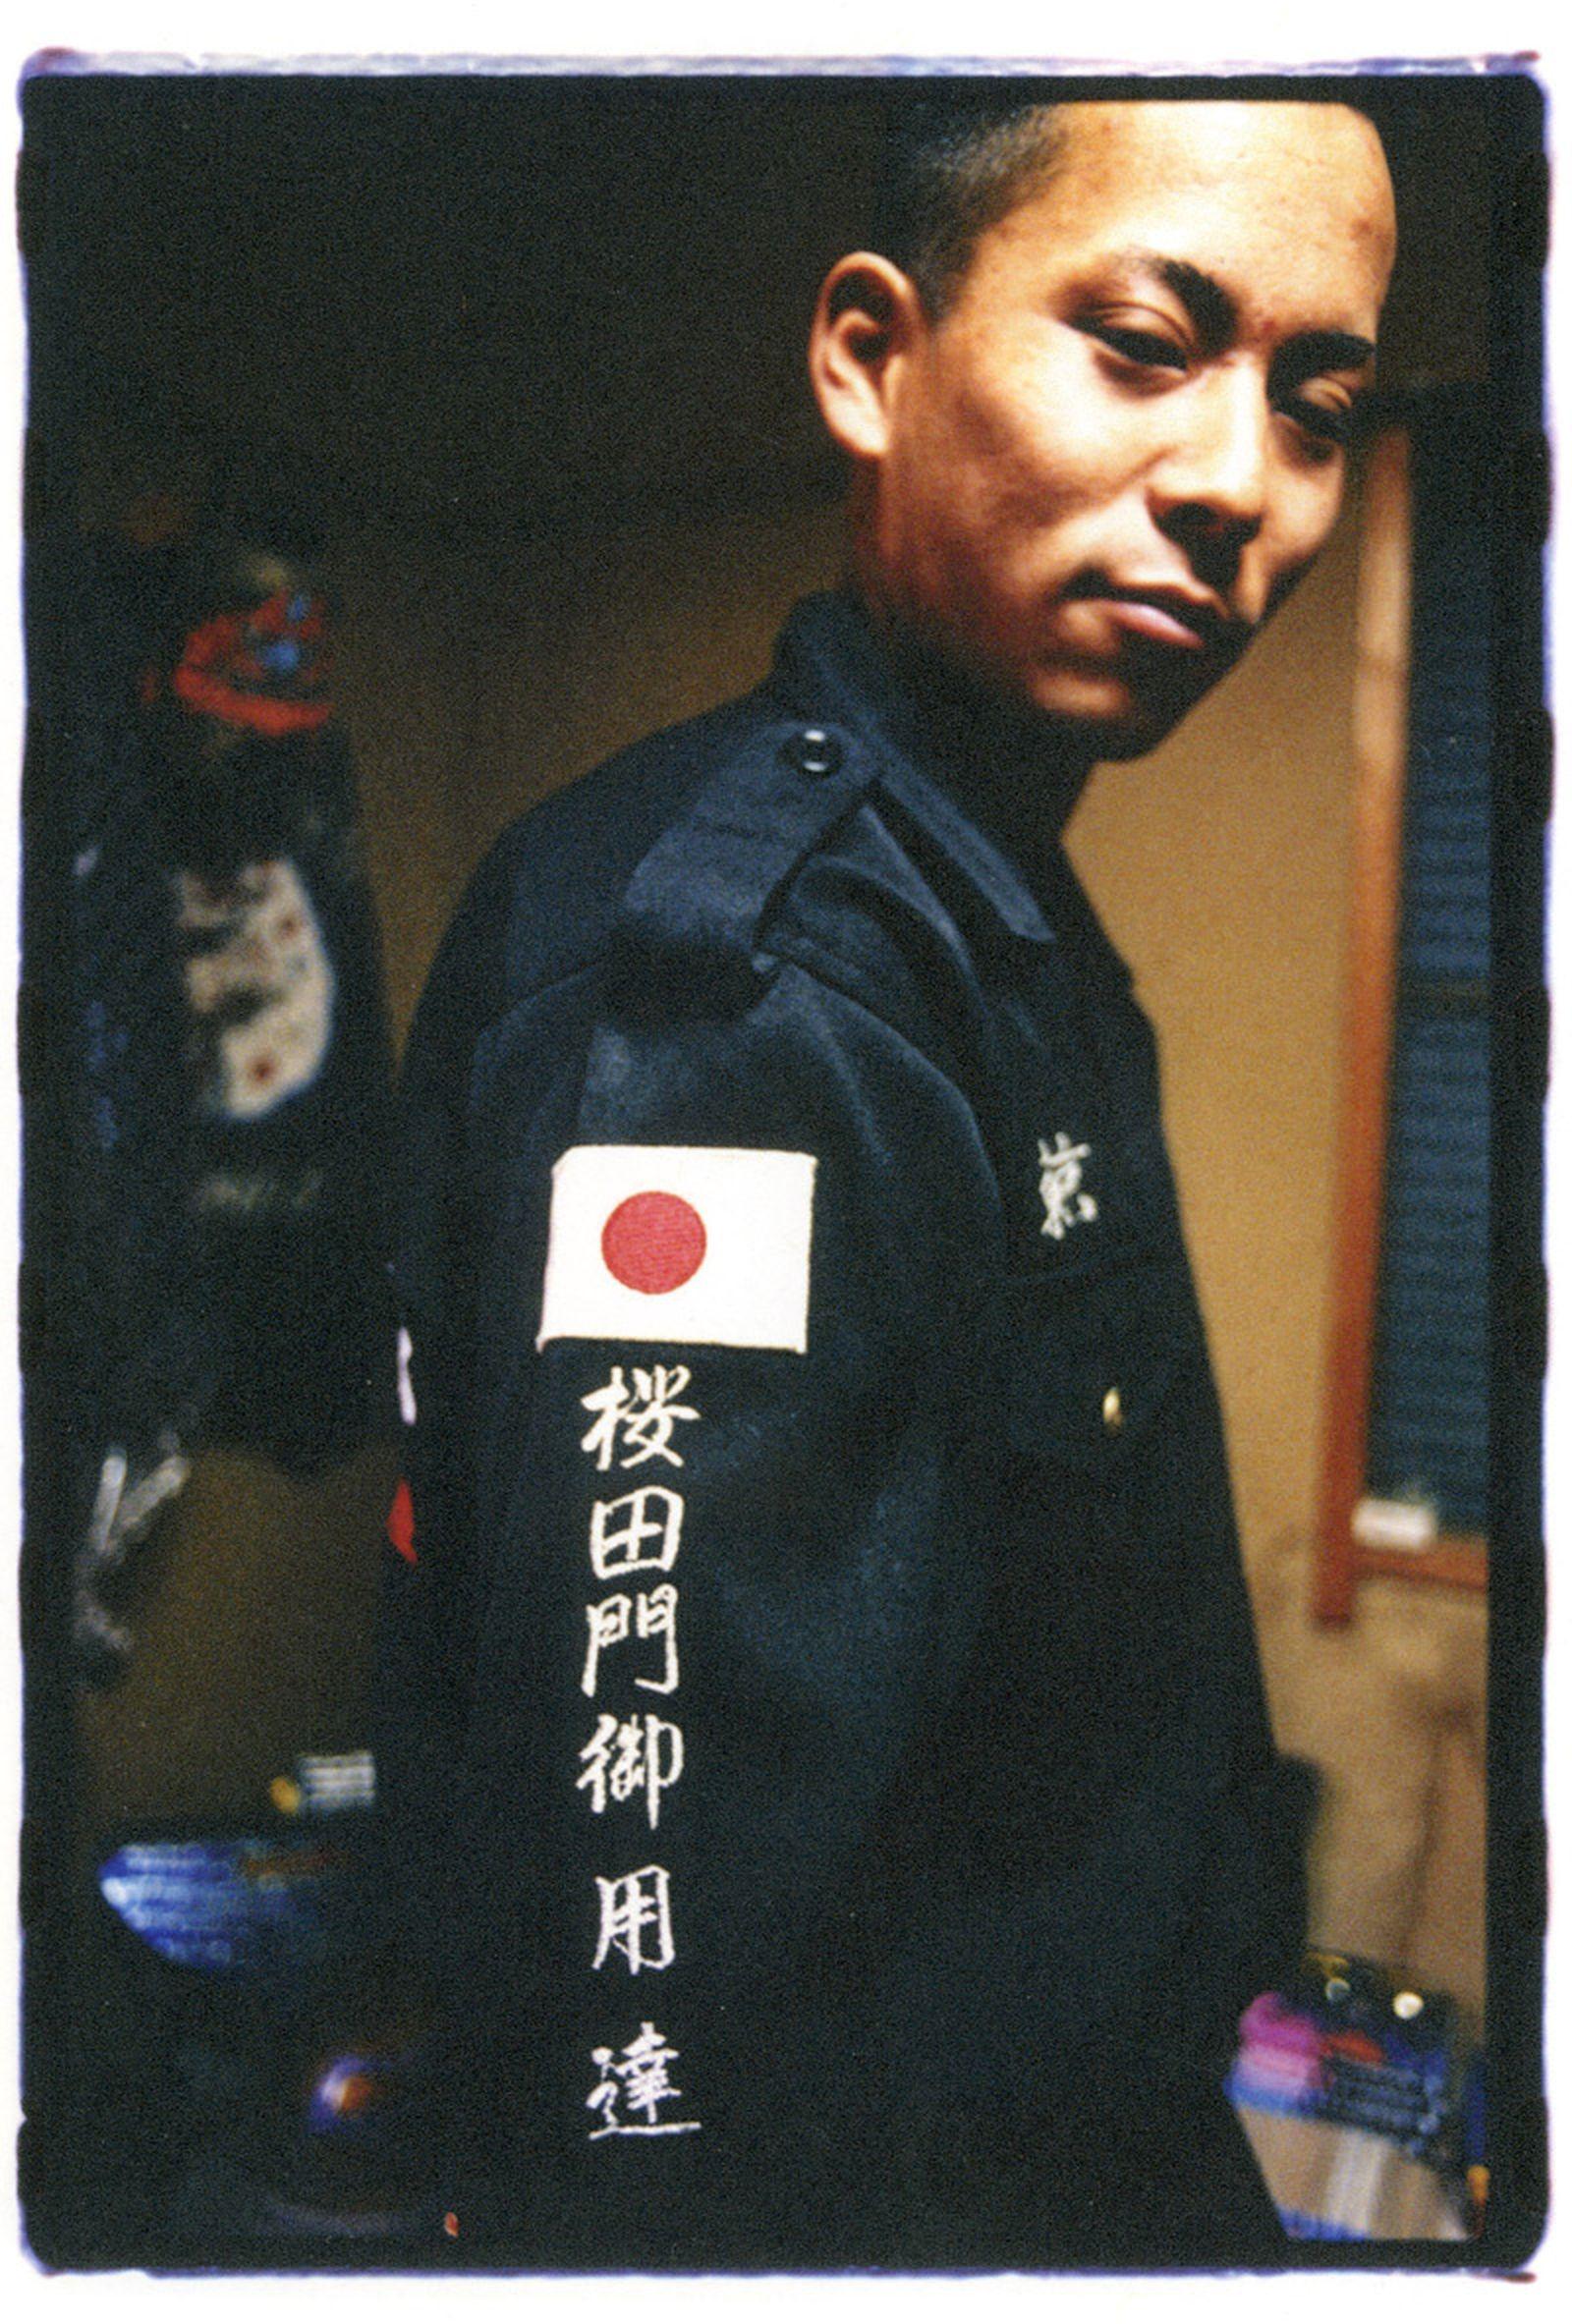 bosozoku-the-stylish-legacy-of-japans-rebel-motorcycle-gangs-4